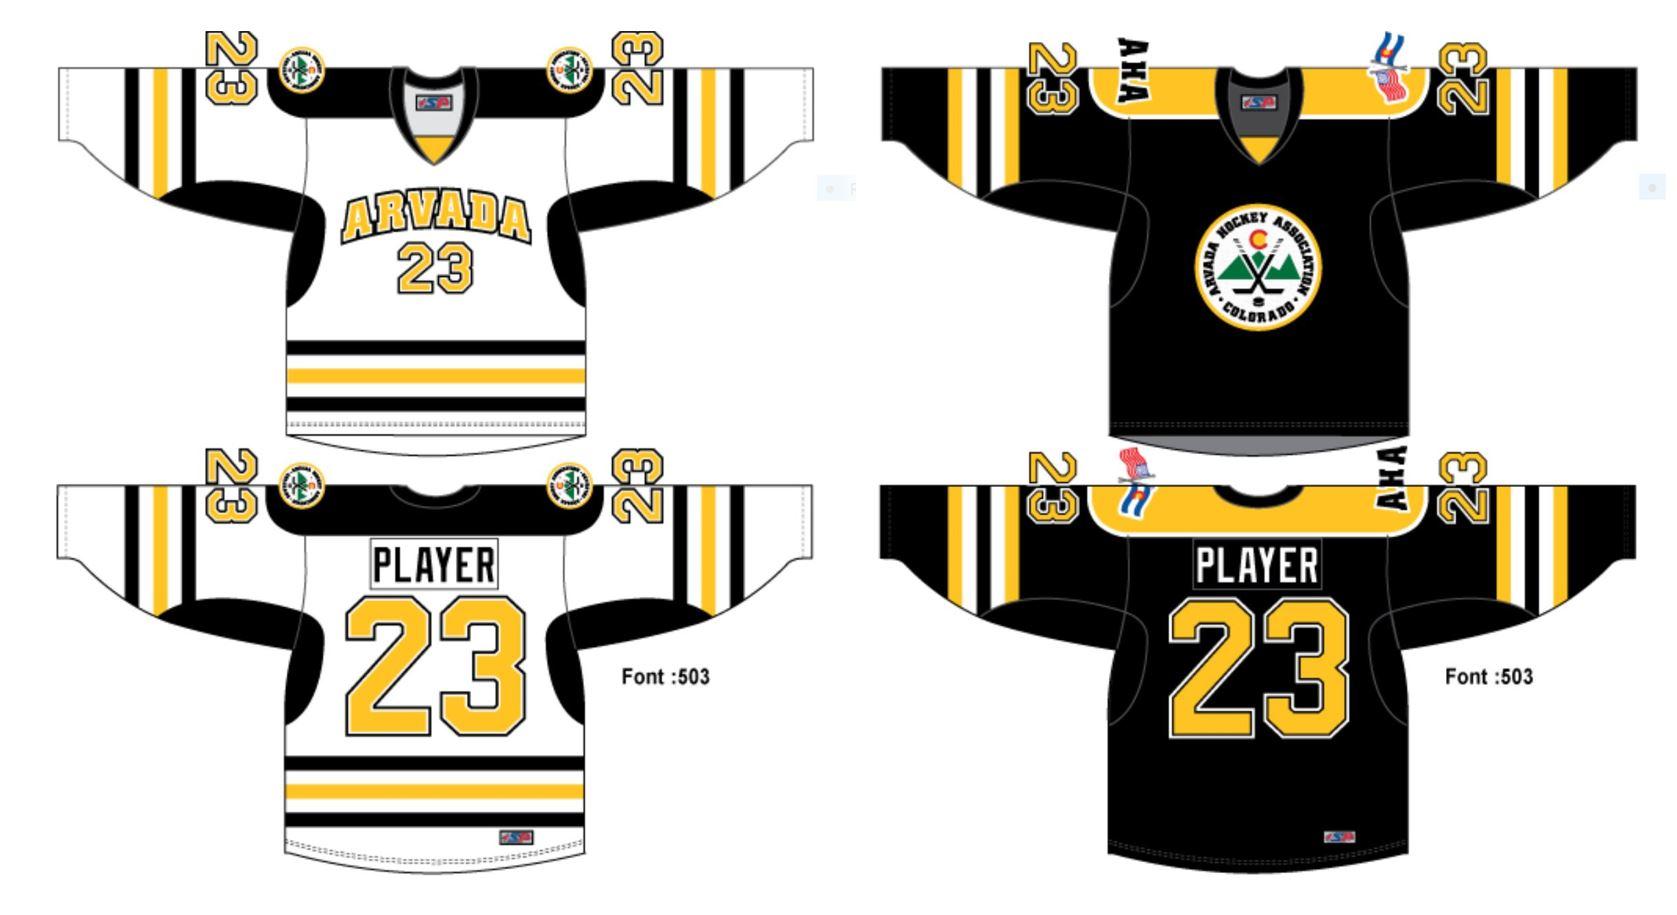 2014 Arvada Hockey Association